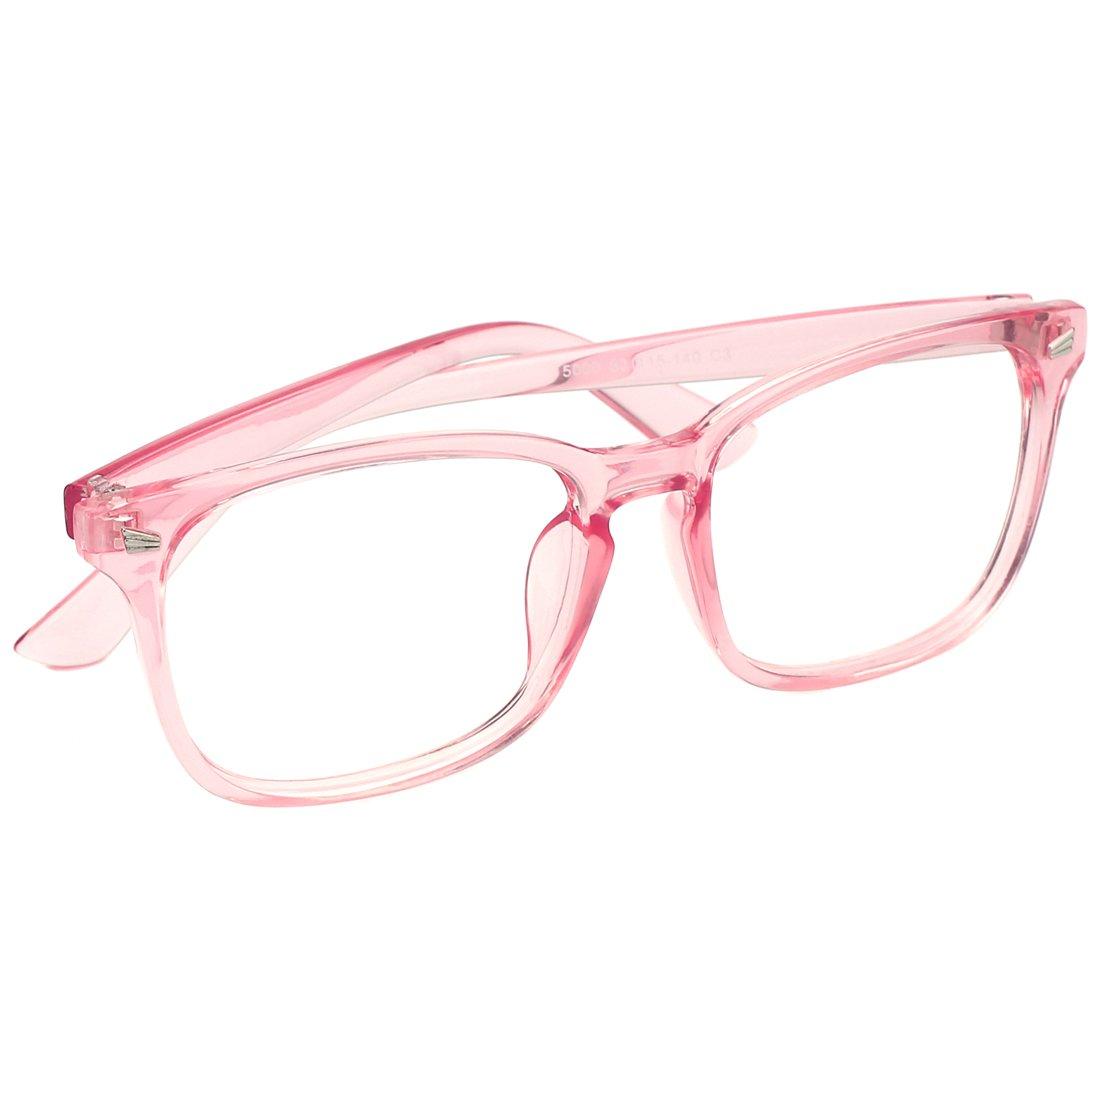 modesoda Unisex Eyewear Nerdy Classic Eyeglasses Frame Clear Lens for Women and Man